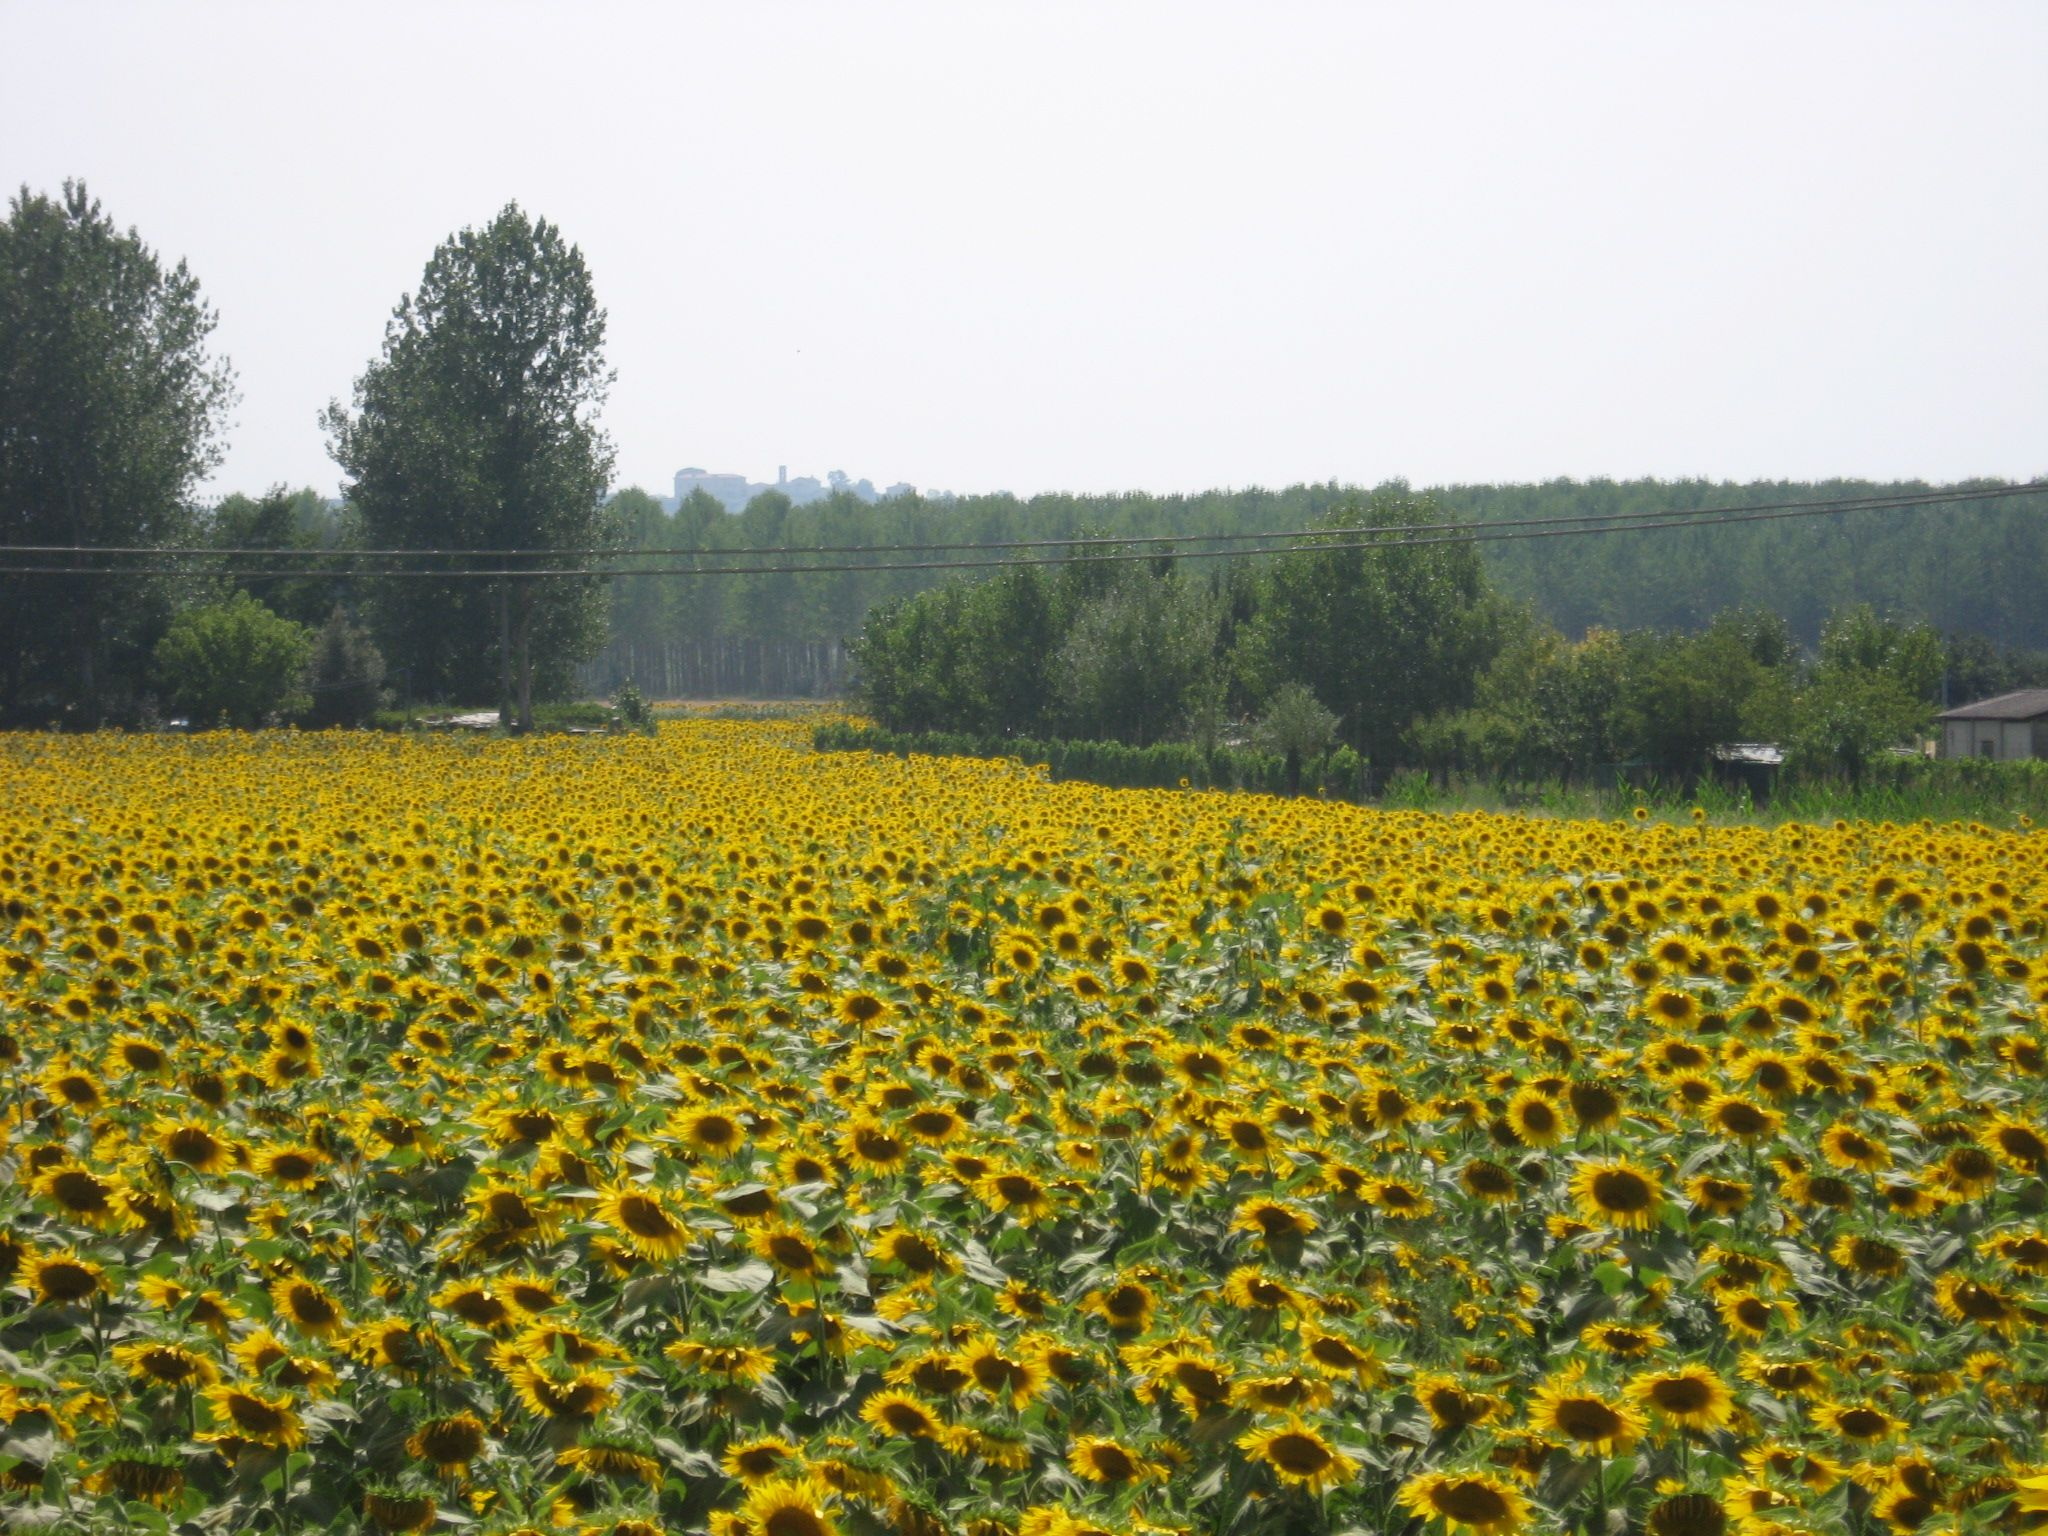 Sunflowers under the Tuscan sun  keritravel@gmail.com